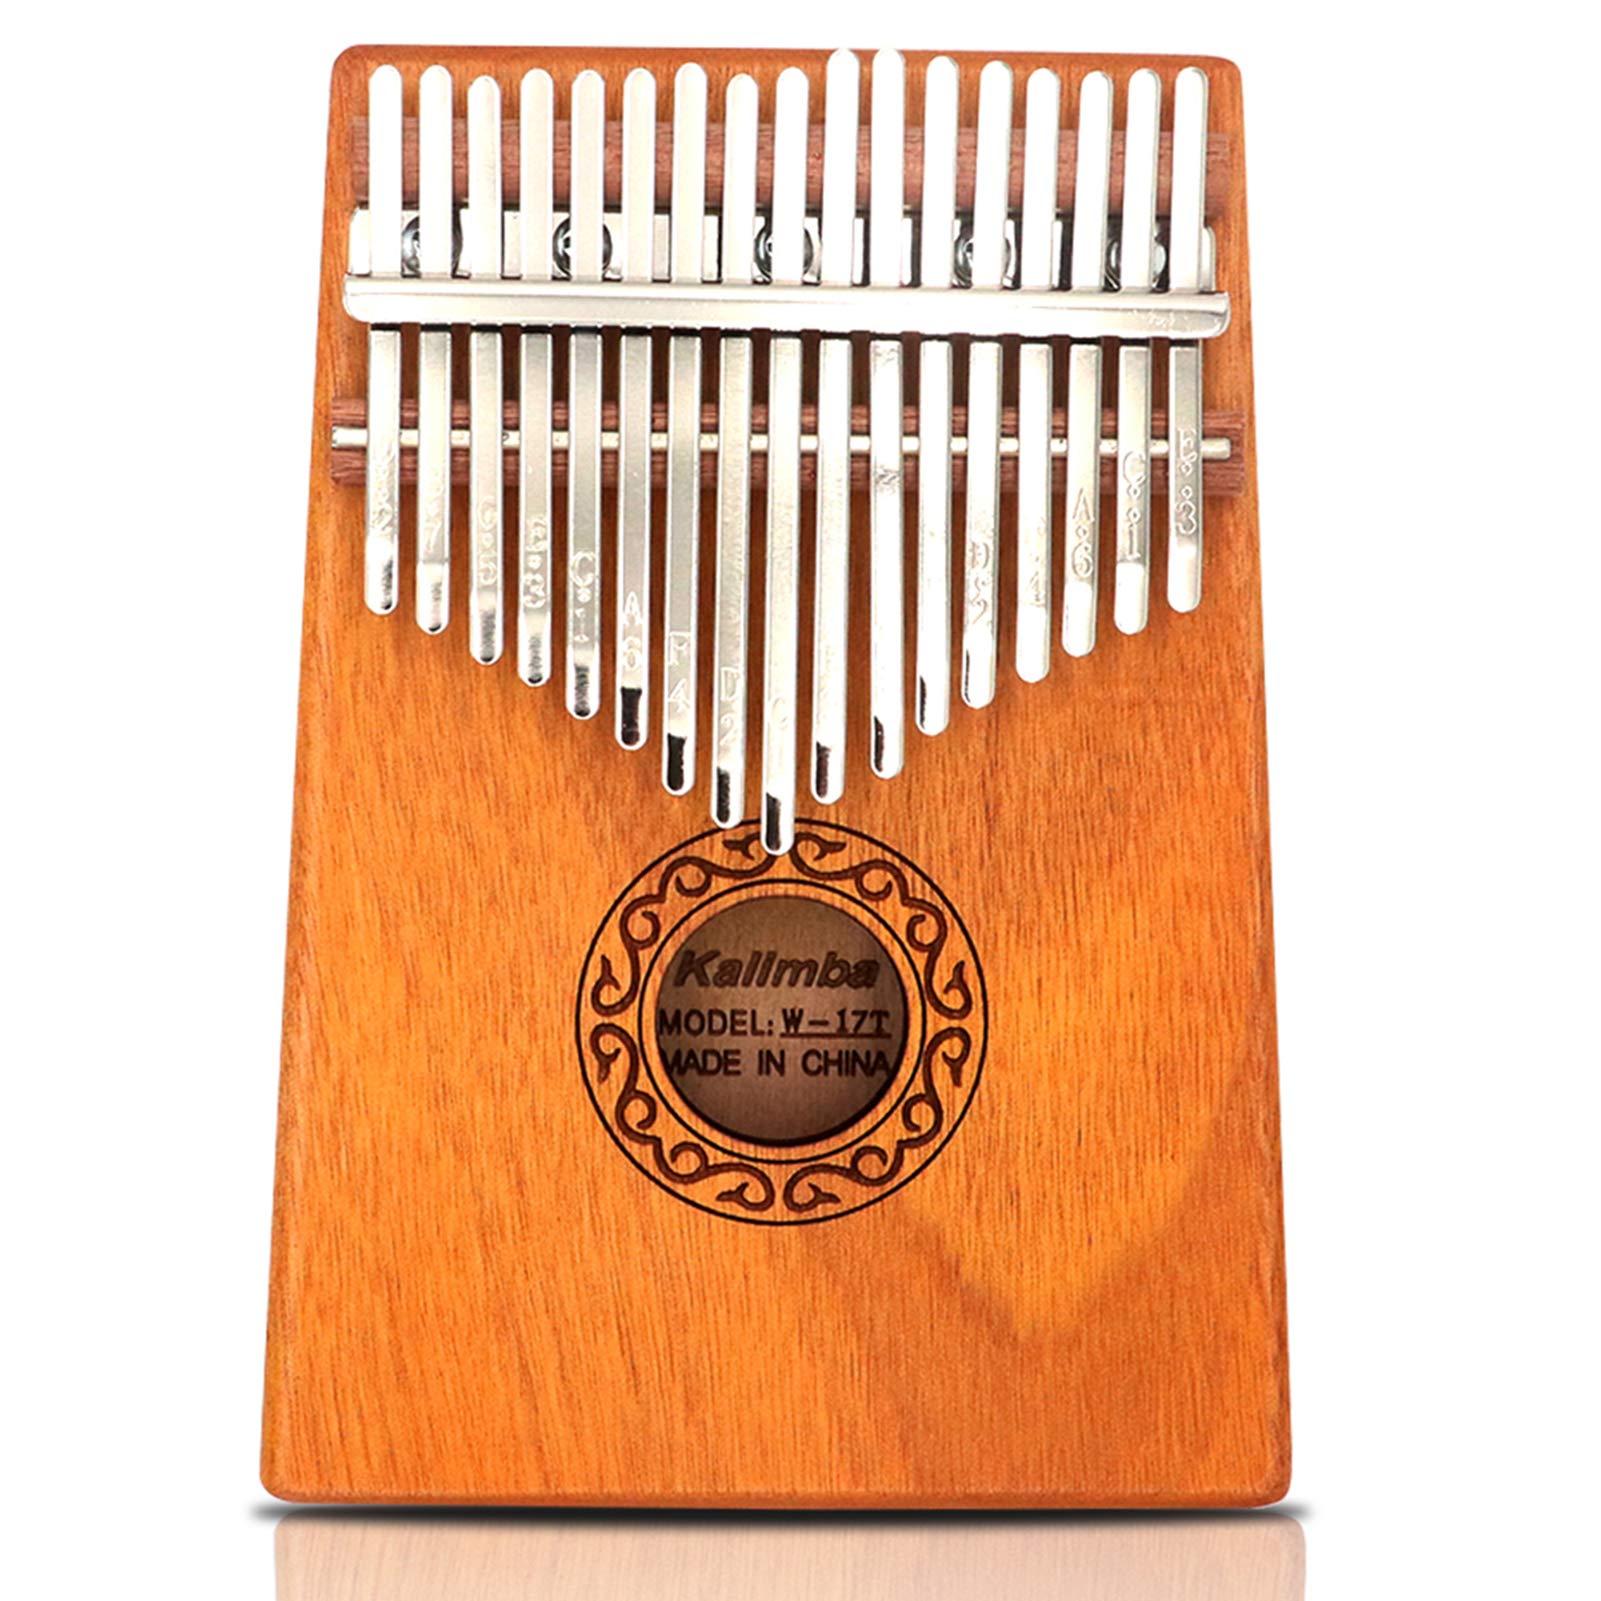 GUNAI Kalimba 17 Keys Thumb Piano Portable Thumb Finger Piano Mahogany Marimba Instrument with Tuning Hammer and 7 Accessories for Music Lover Beginners